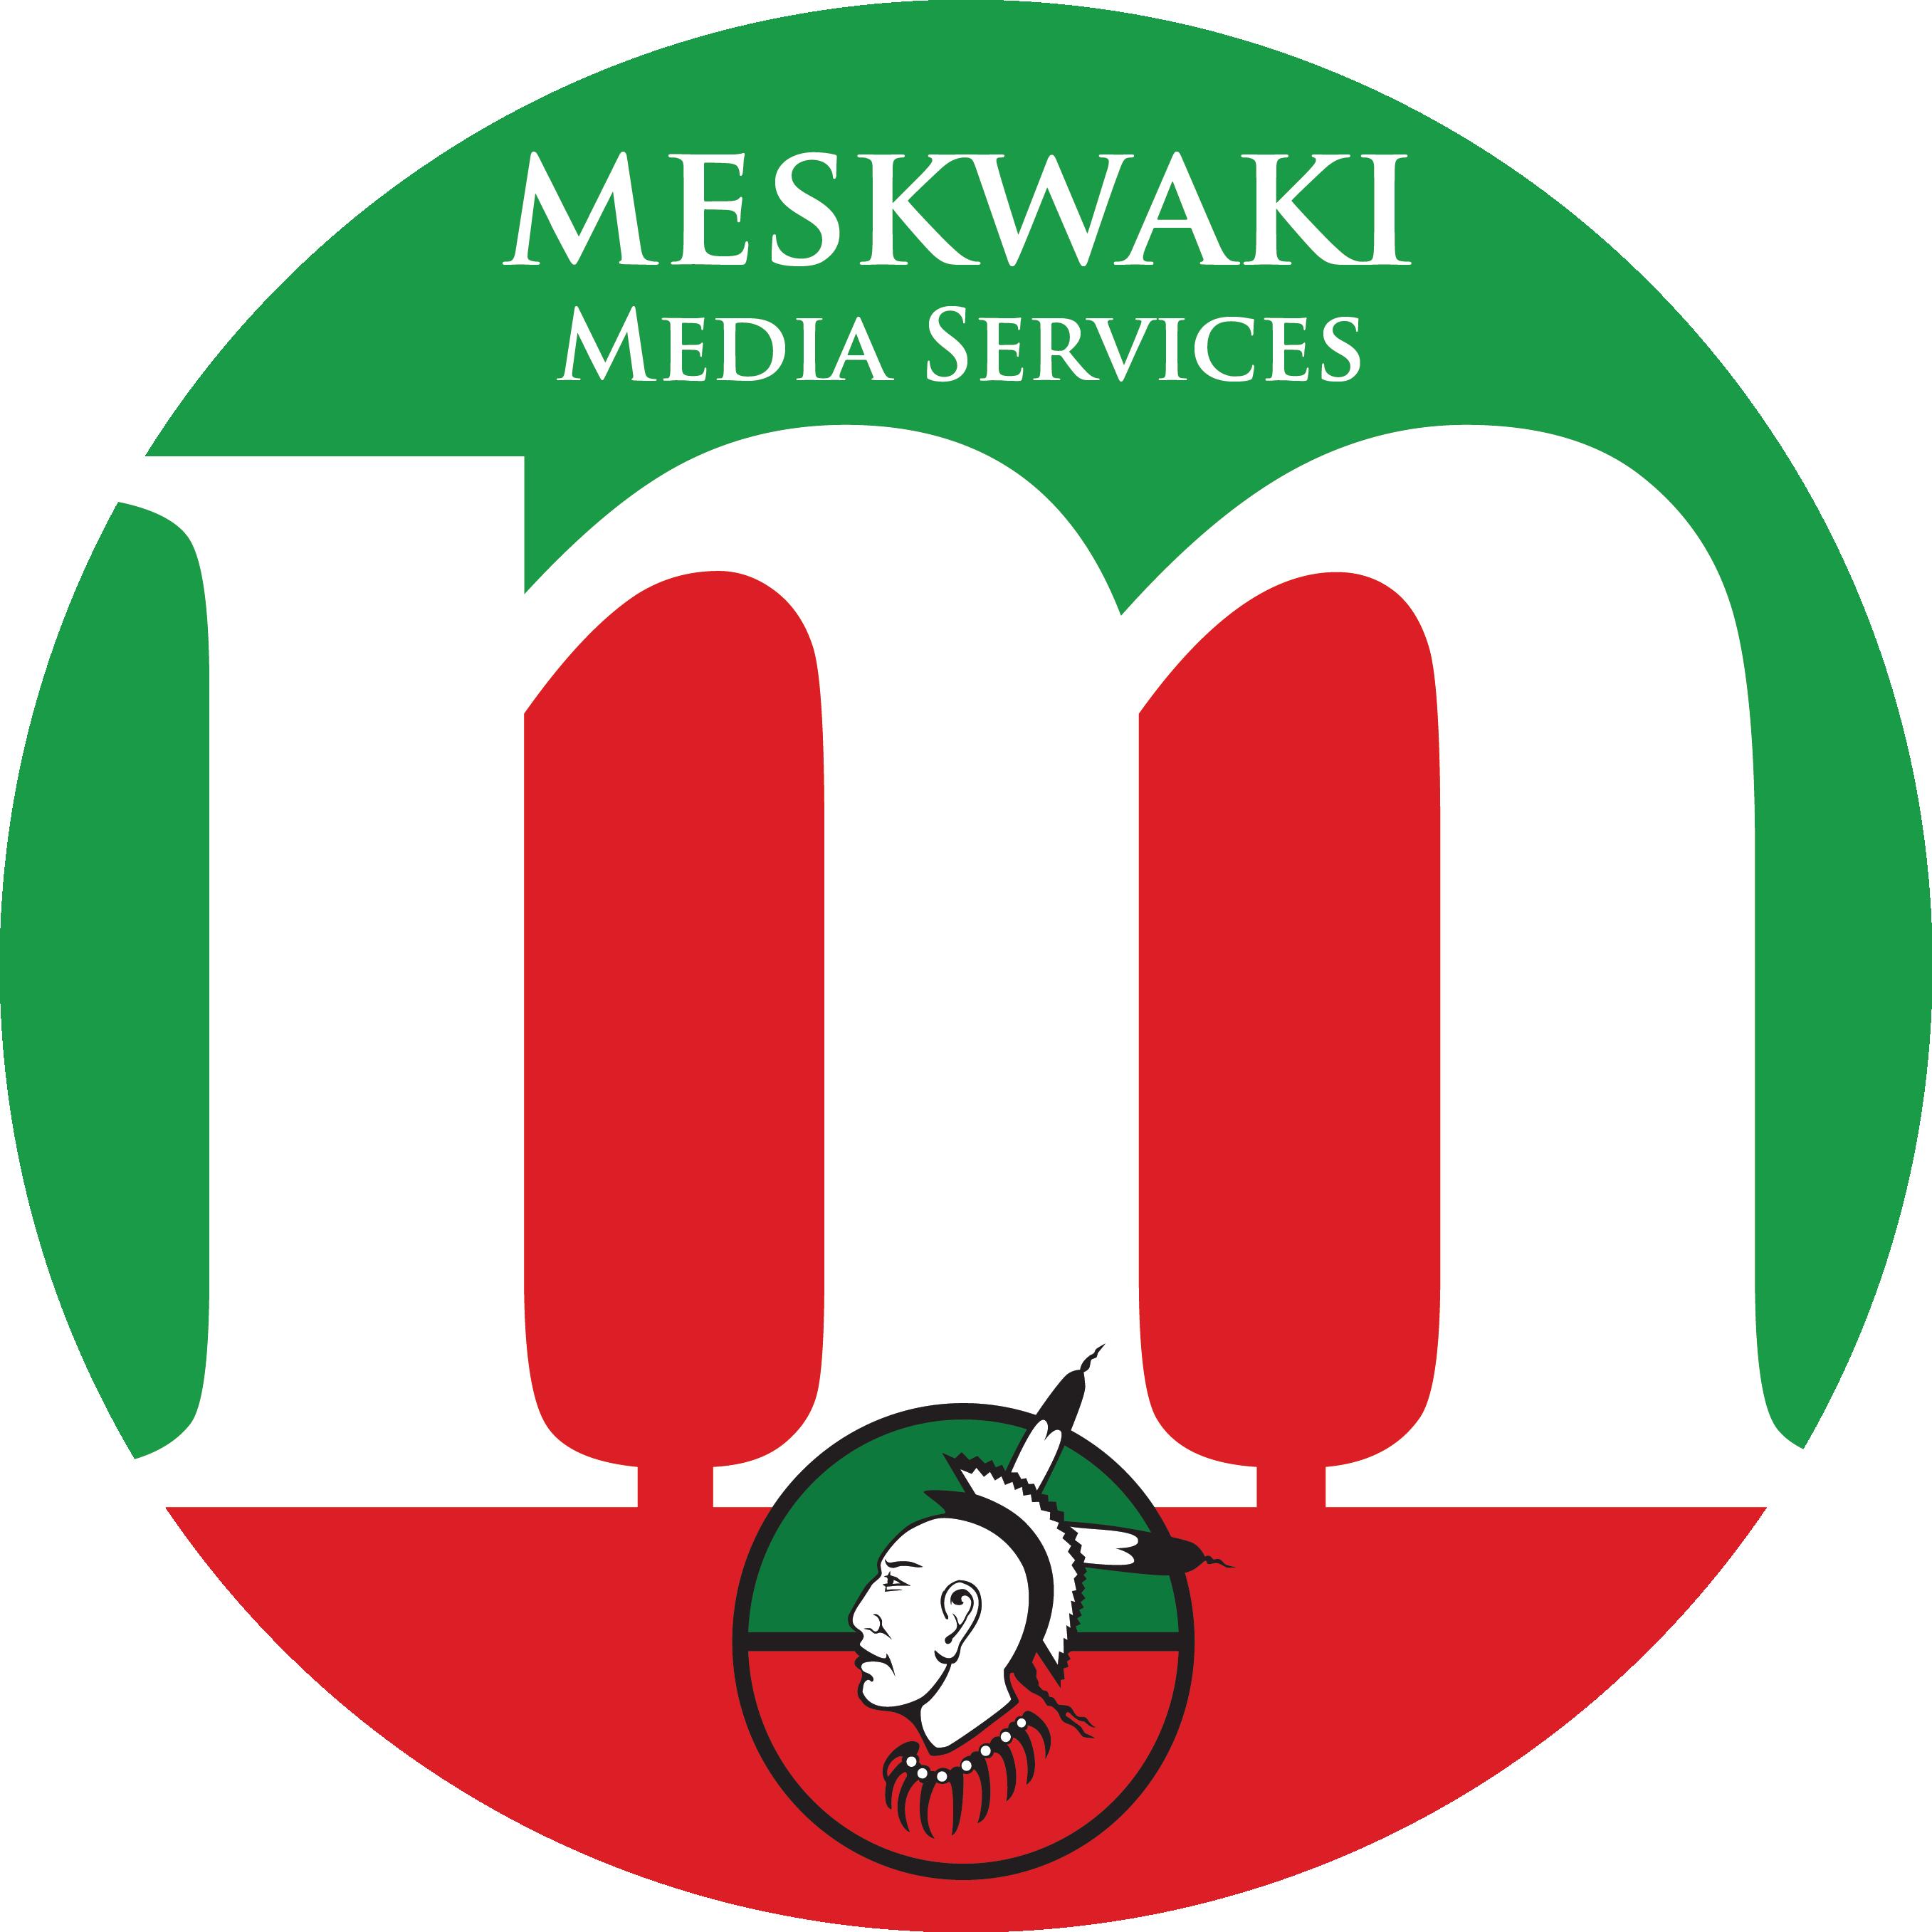 Meskwaki Media Services